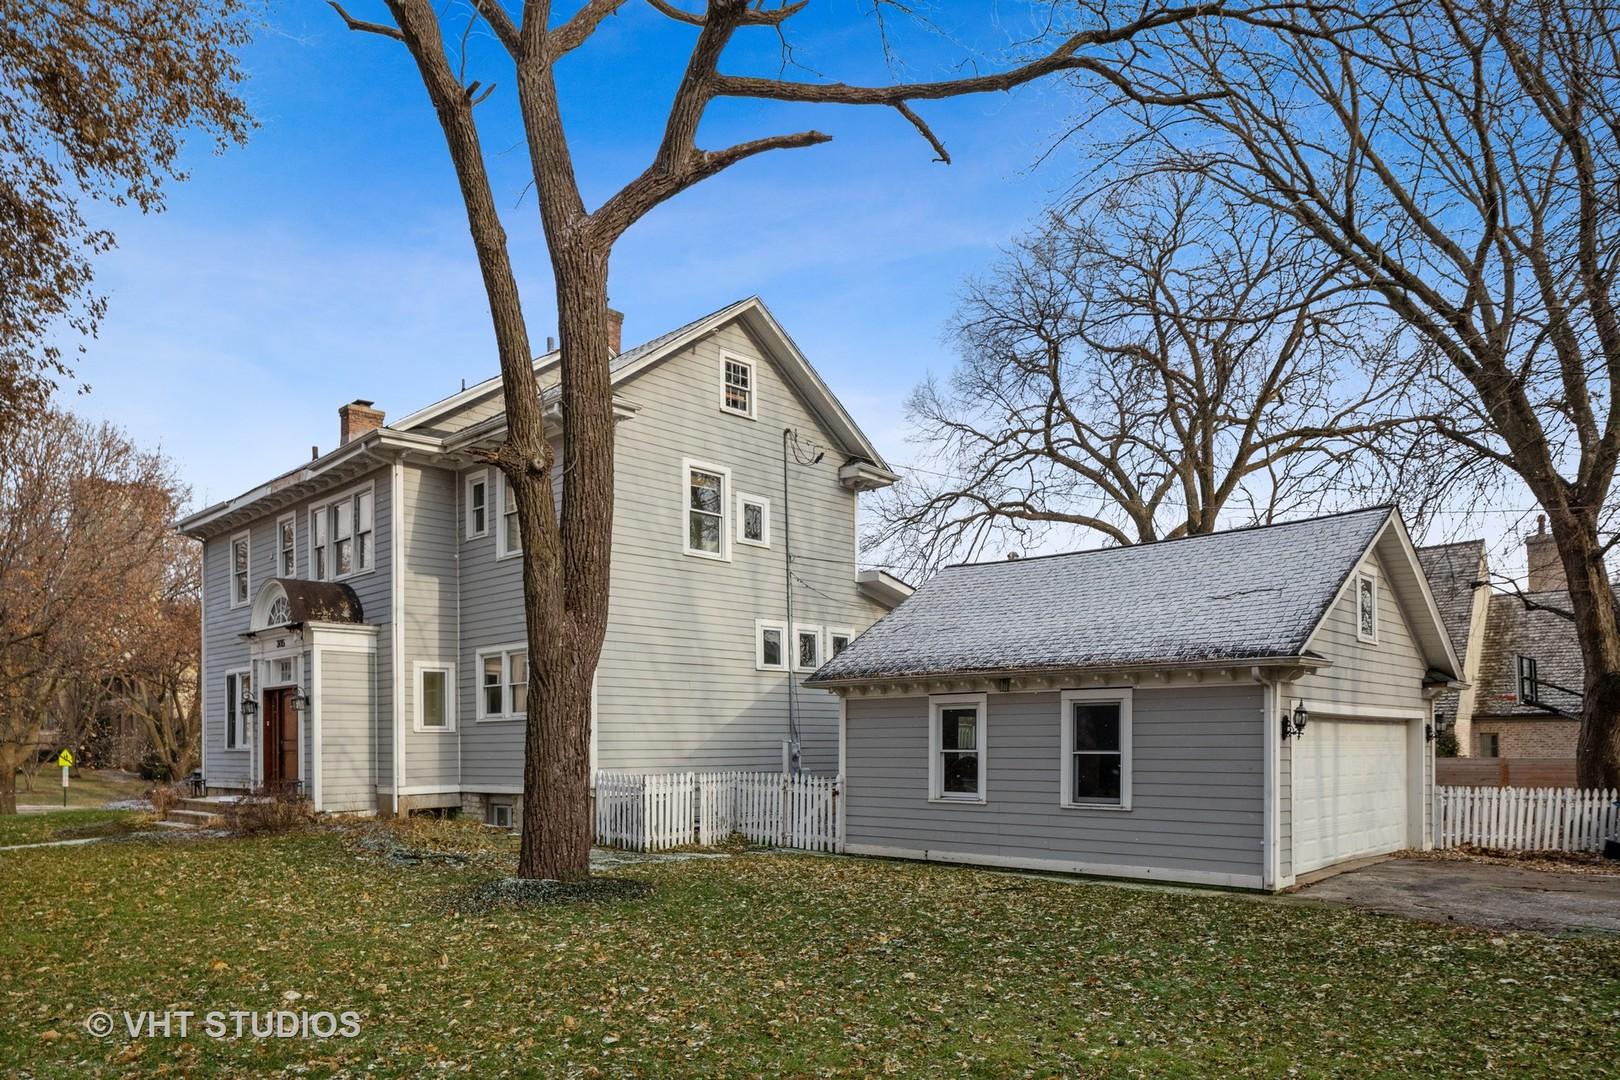 305 South Garfield, Hinsdale, Illinois, 60521